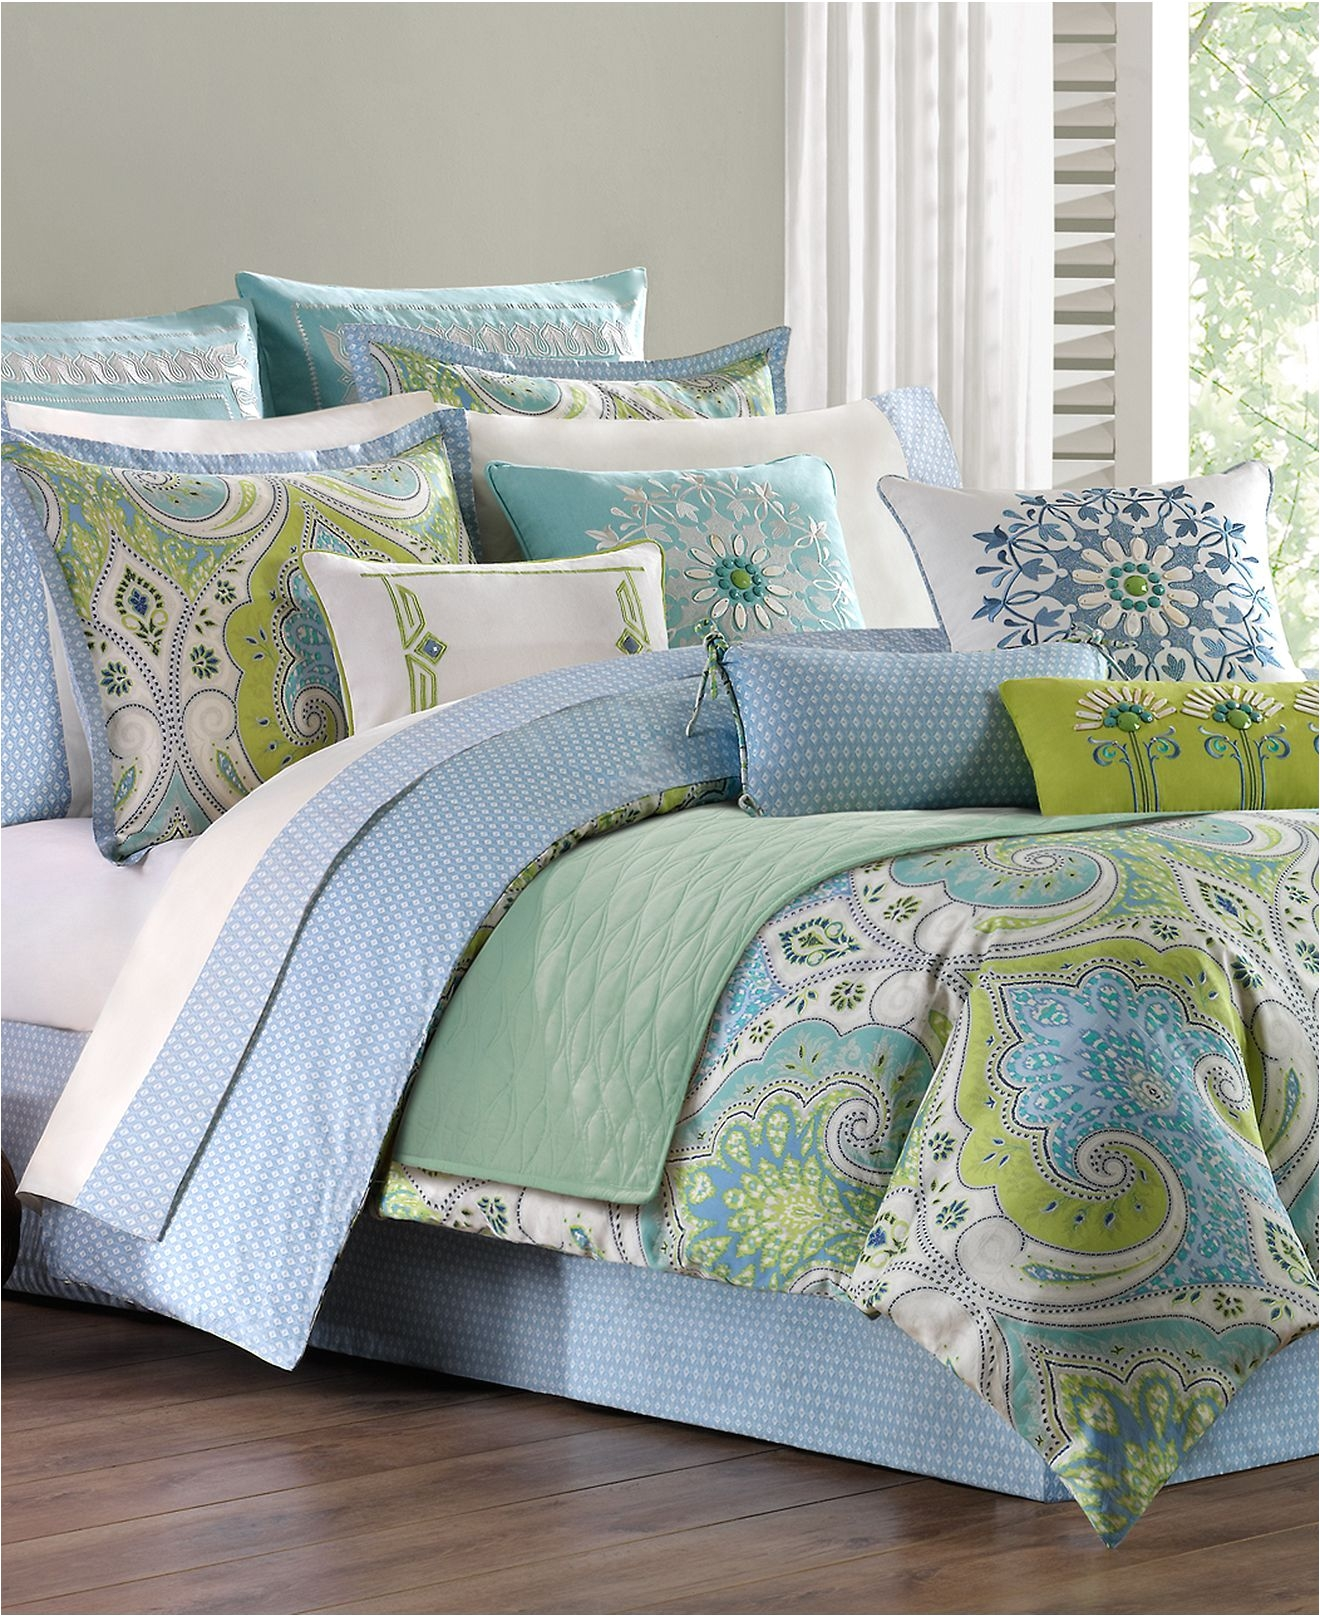 Macys Bedroom Comforter Sets Echo Sardinia Reversible Bedding Collection 300 Thread Count 100